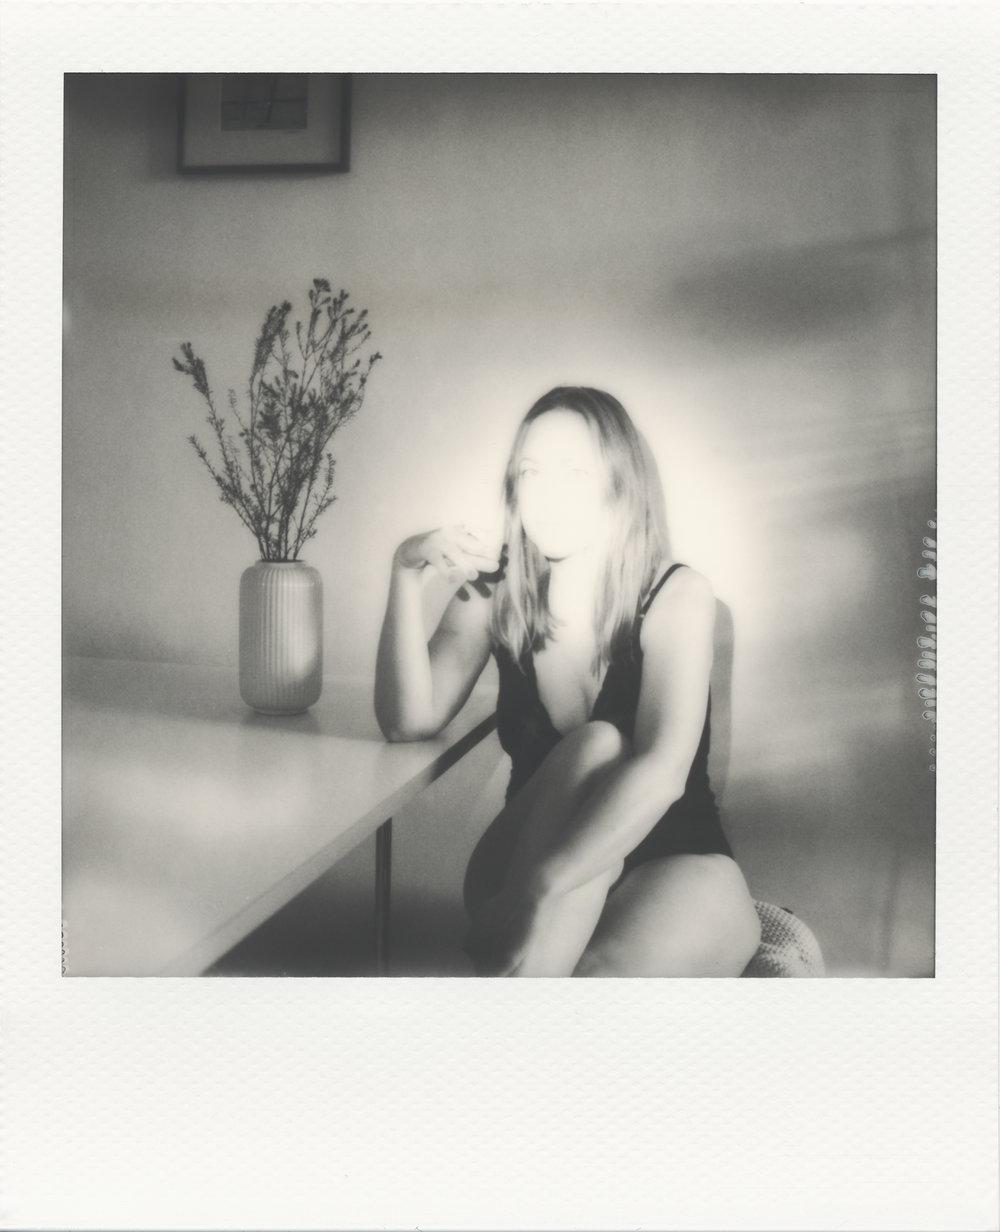 Jennifer_Rumbach_Polaroids_SW_190408_03.jpg